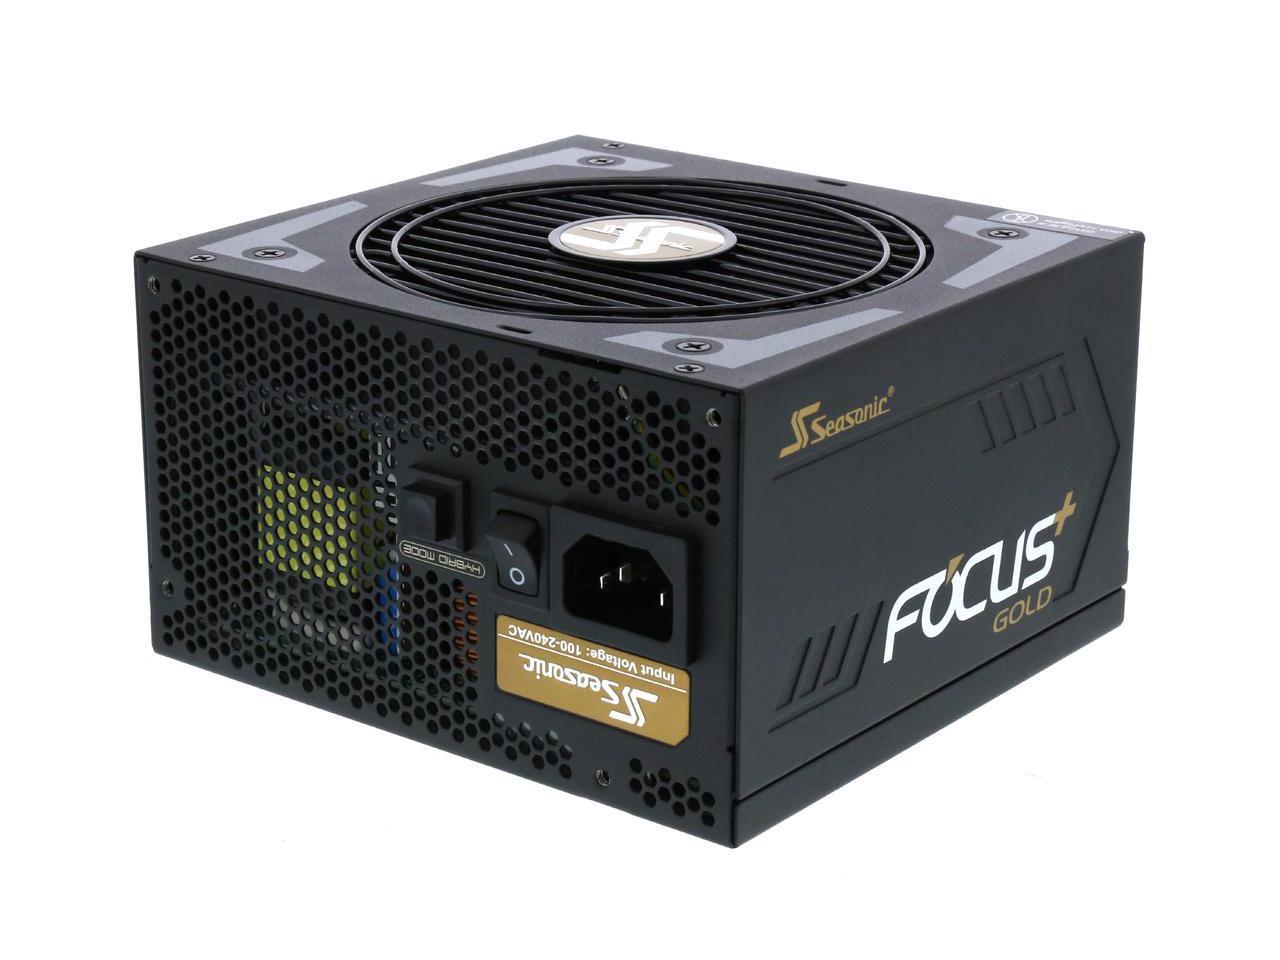 750W Seasonic FOCUS Plus Series 80 Plus Gold Full Modular Power Supply (SSR-750FX) for $57.90 AR & More + Free Ship @ Newegg.com